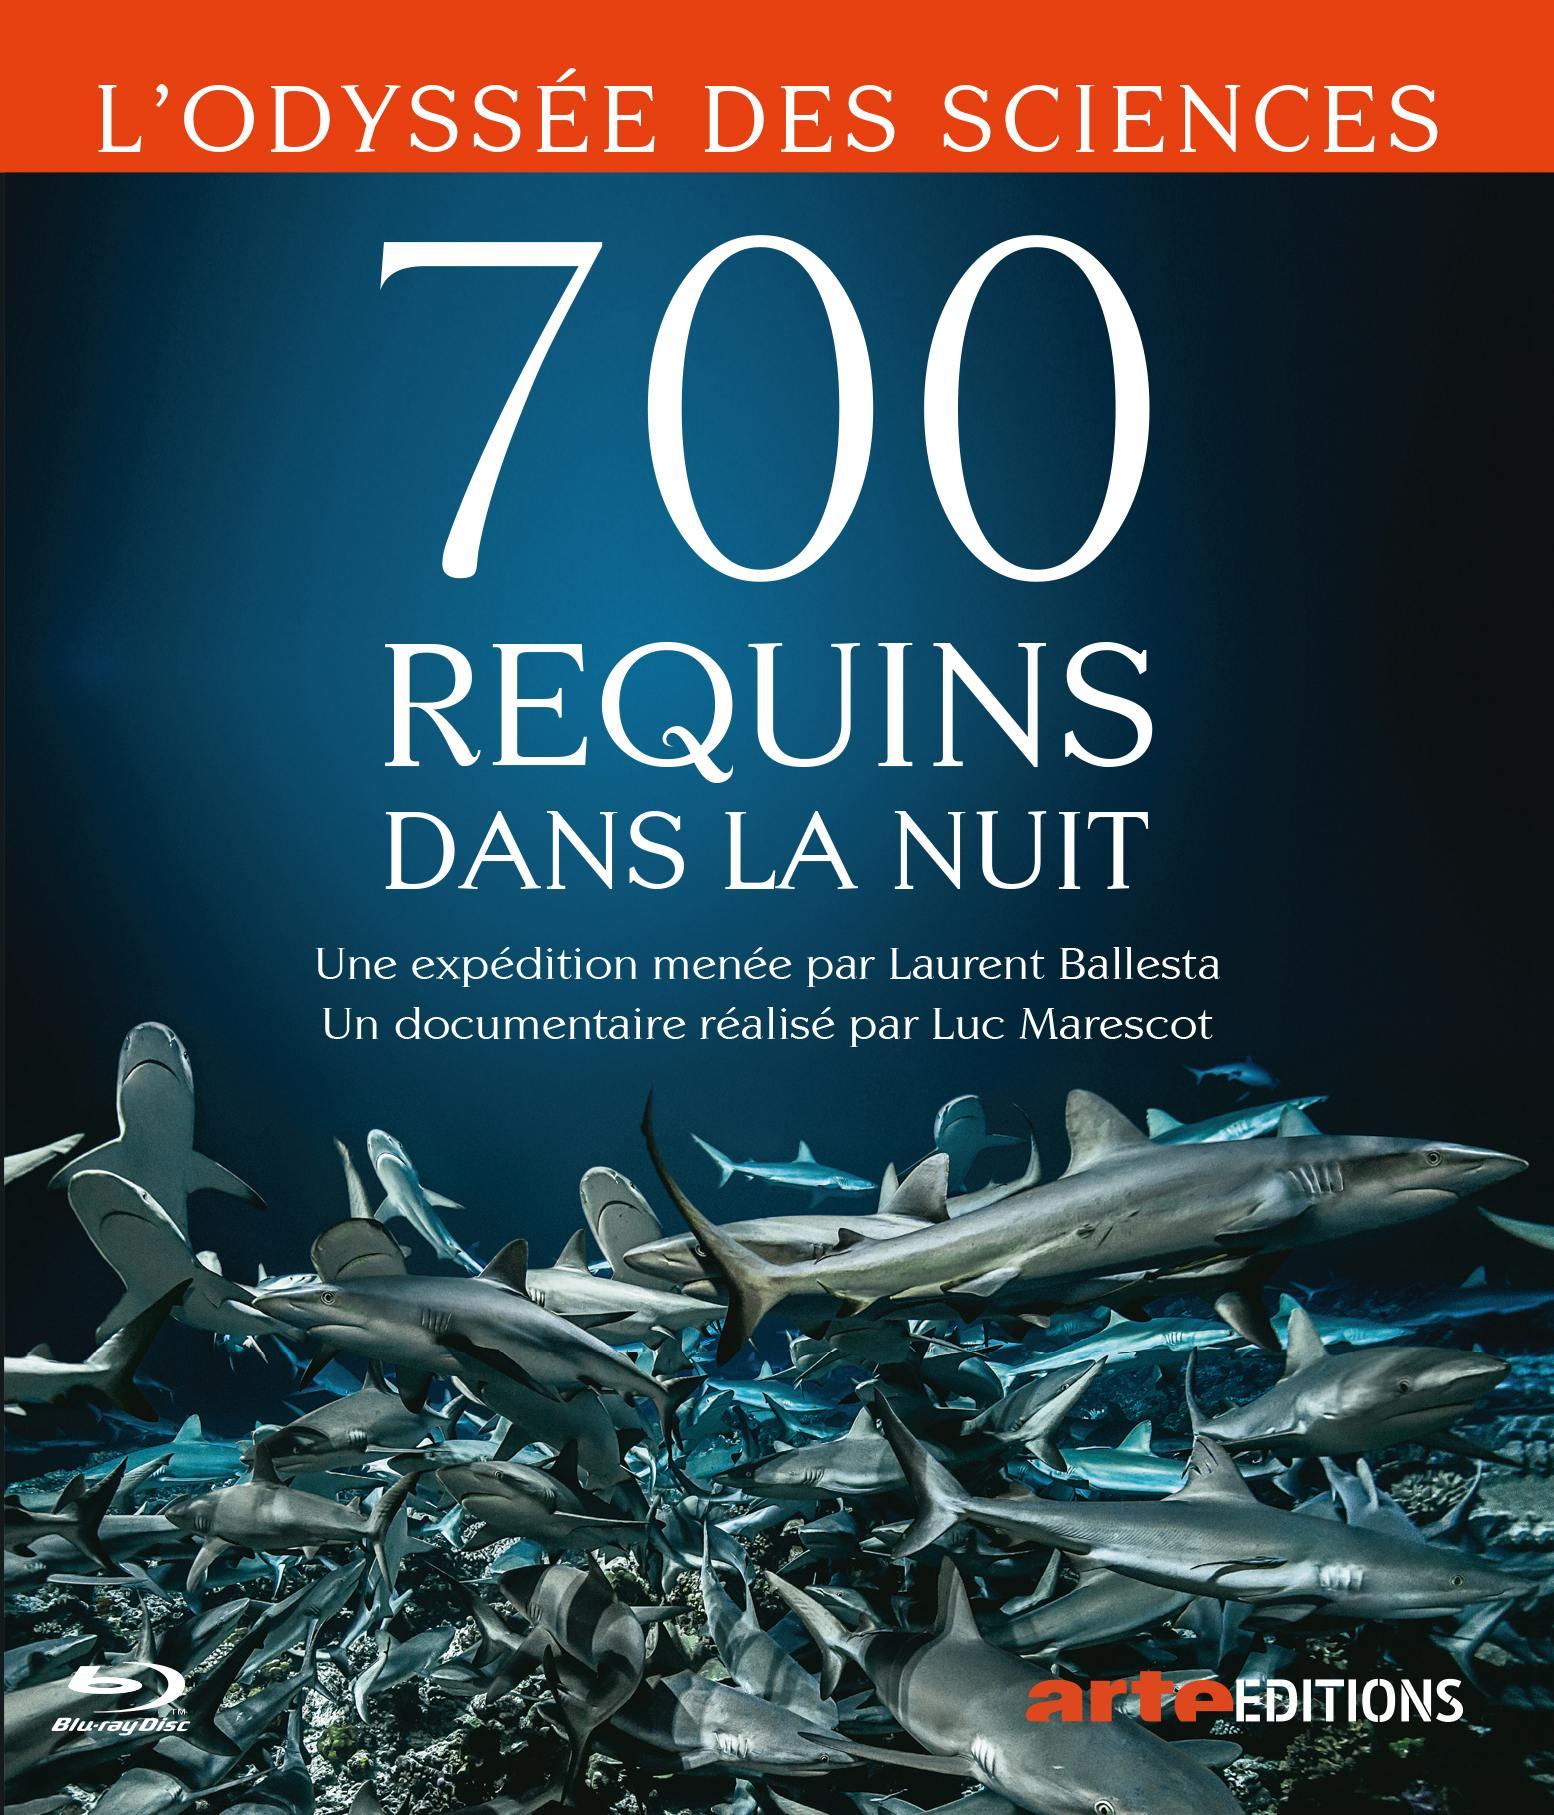 700 requins dans la nuit - combo dvd + blu-ray